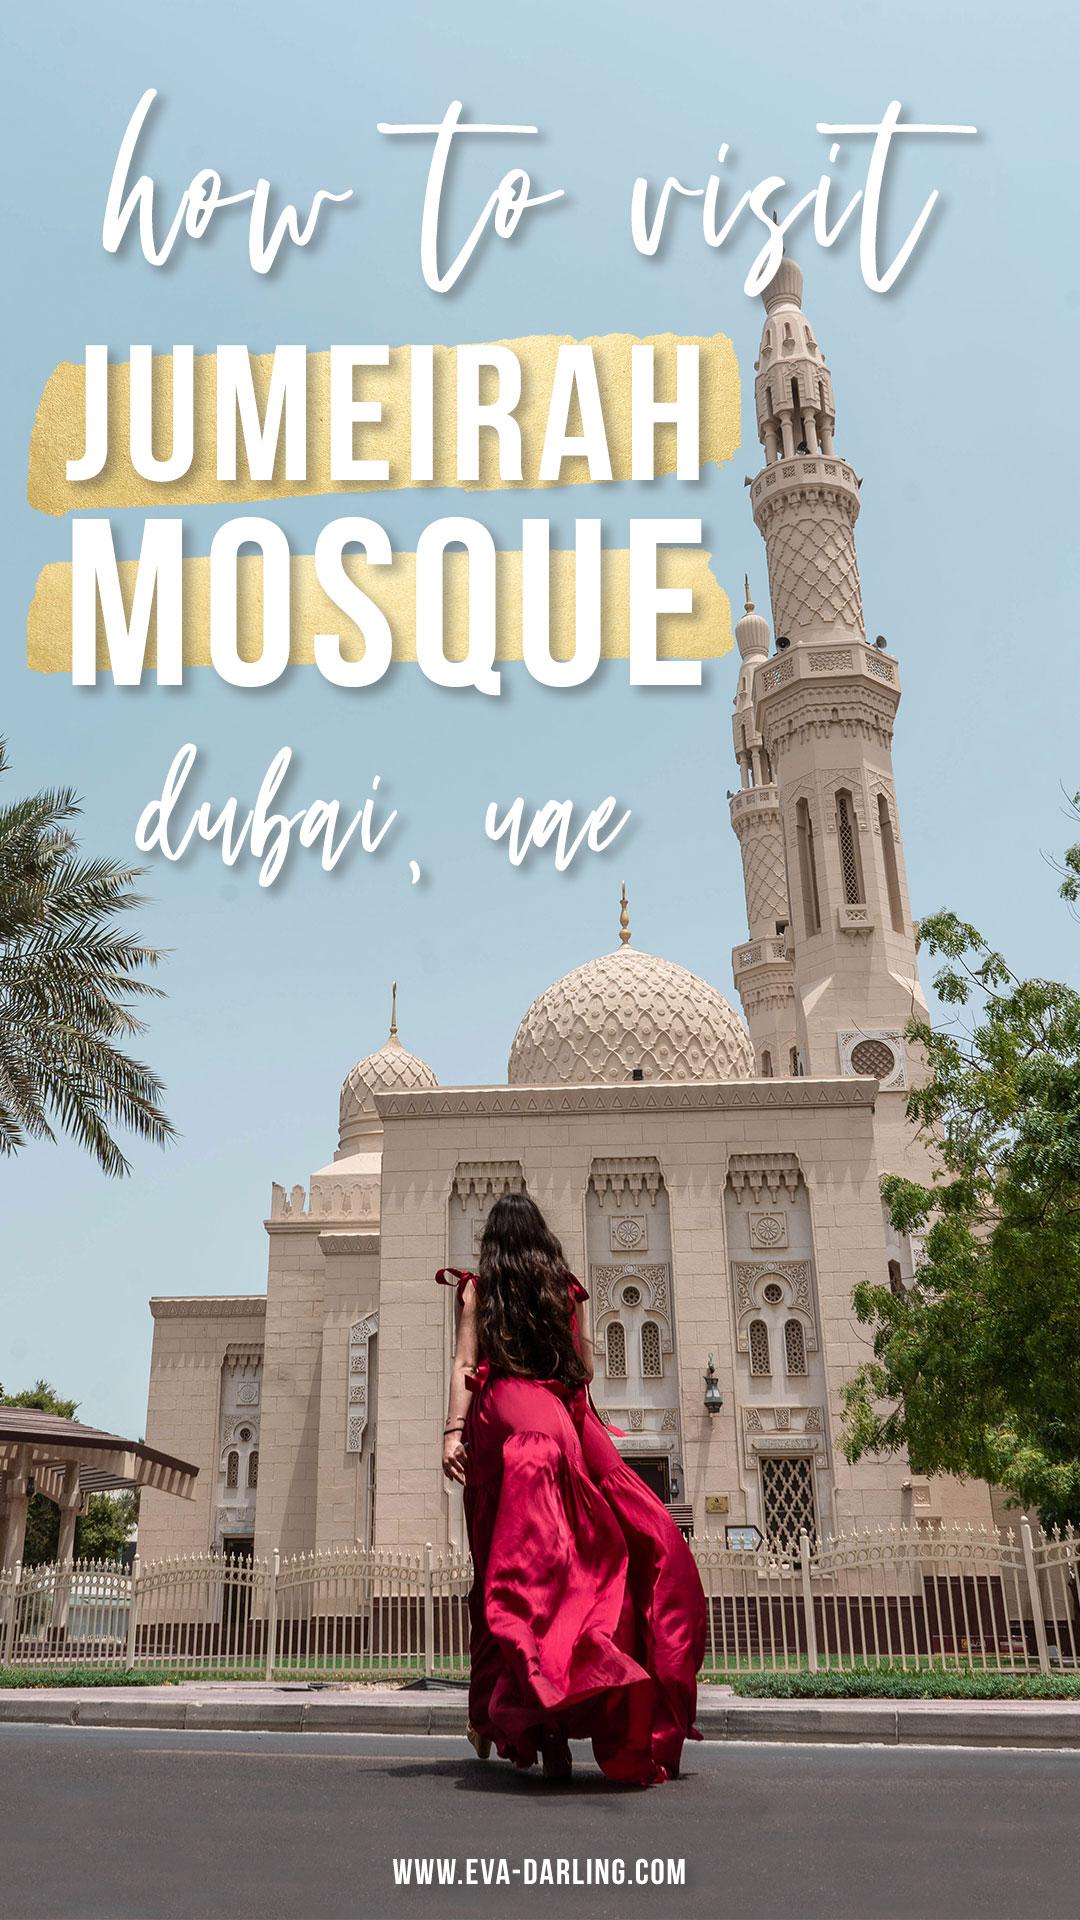 how to visit jumeirah mosque dubai united arab emirates uae perrin and co anne silk dress burgundy red maxi dress travel beige masjid brunette